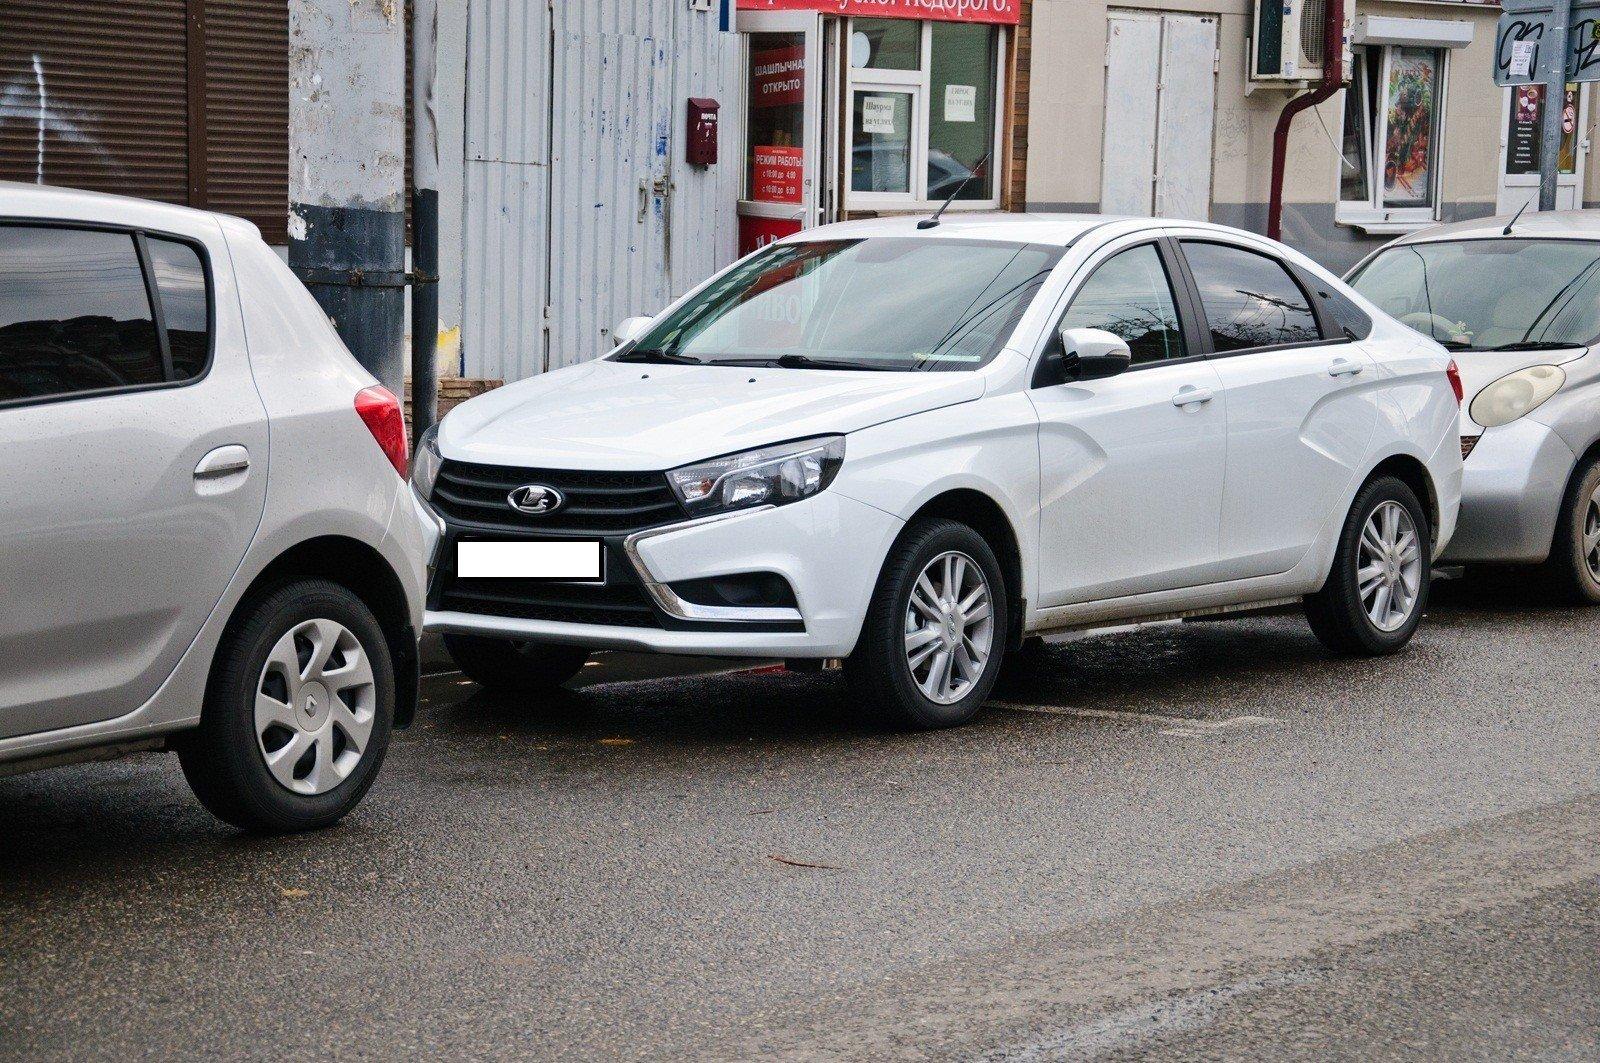 Глава АвтоВАЗа предупредил о снижении экспорта вЕвропу